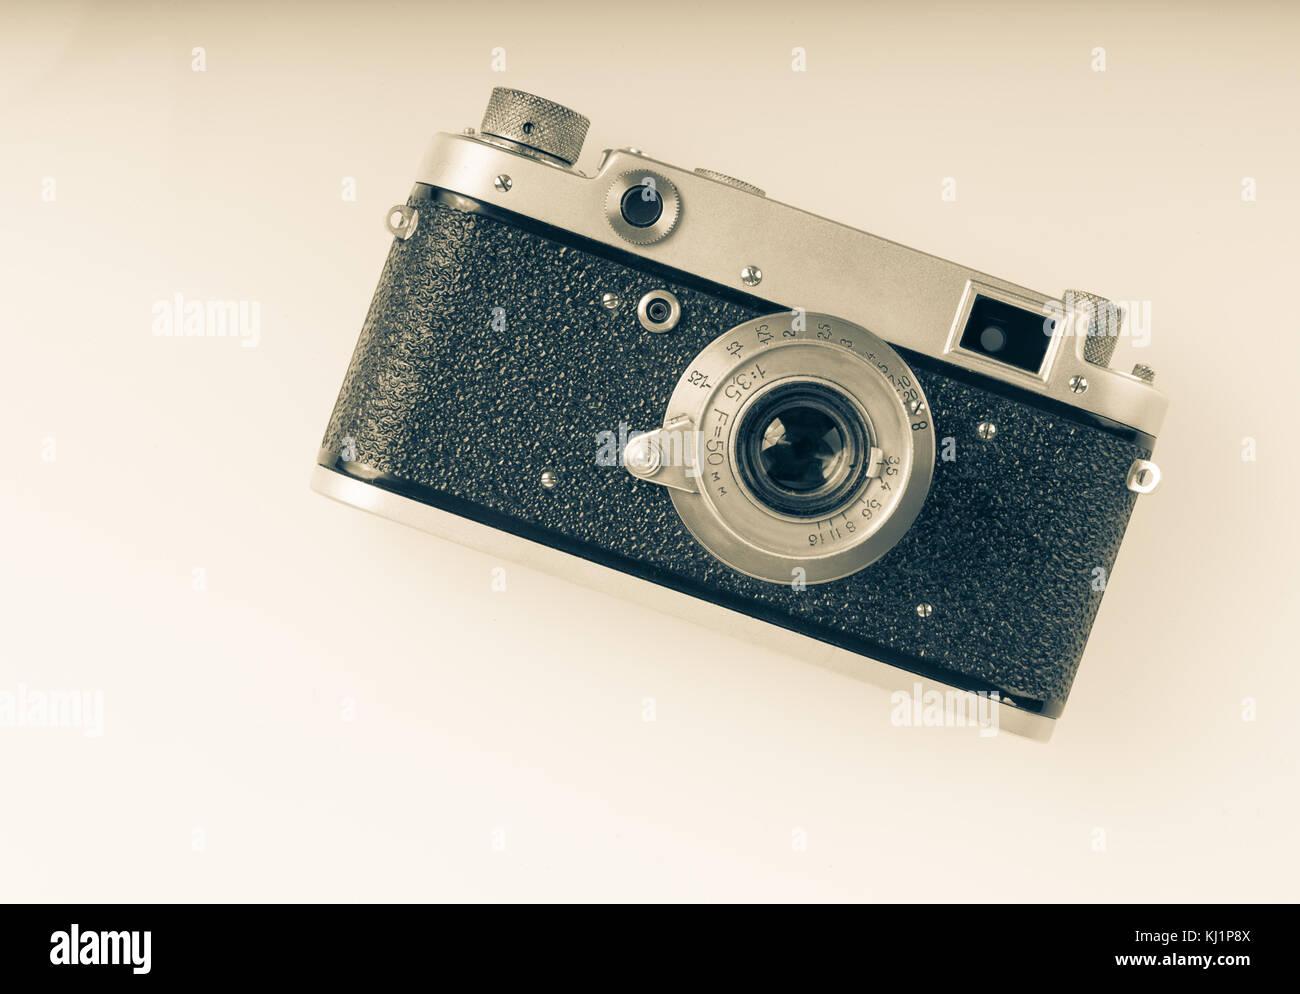 Retro rangefinder camera - Stock Image